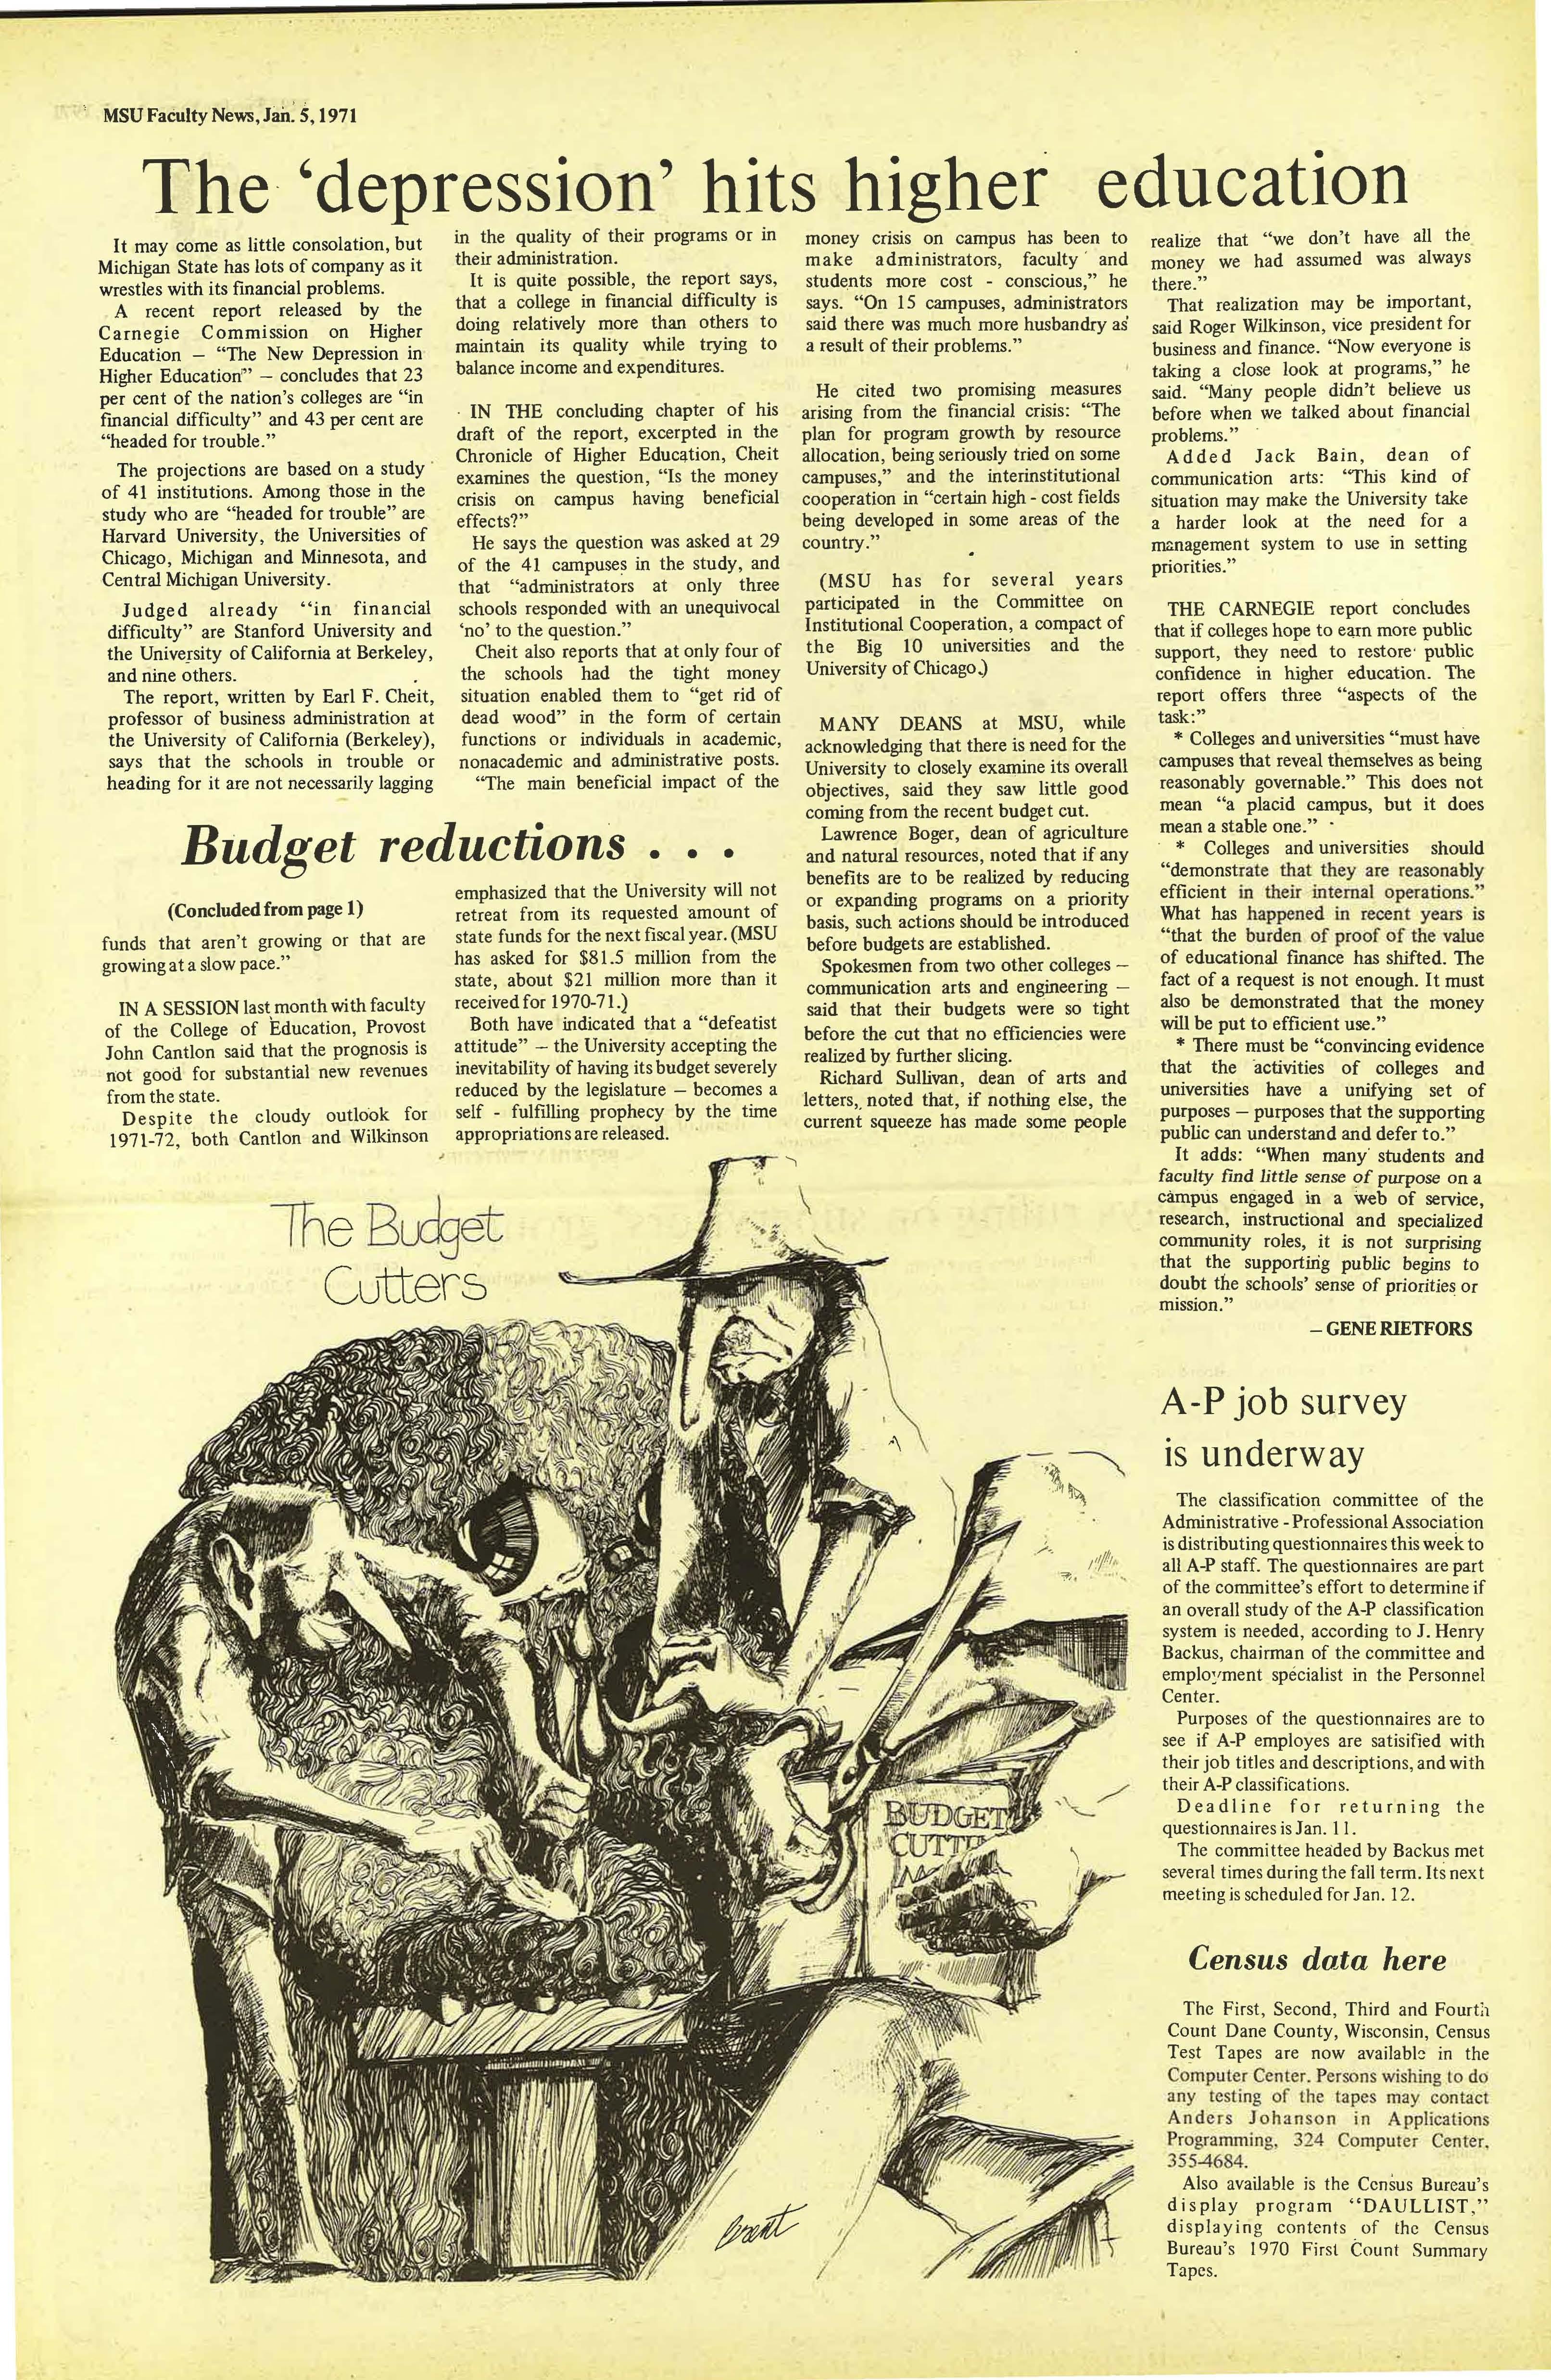 MSU News Bulletin, vol. 3, No. 1, September 23, 1971